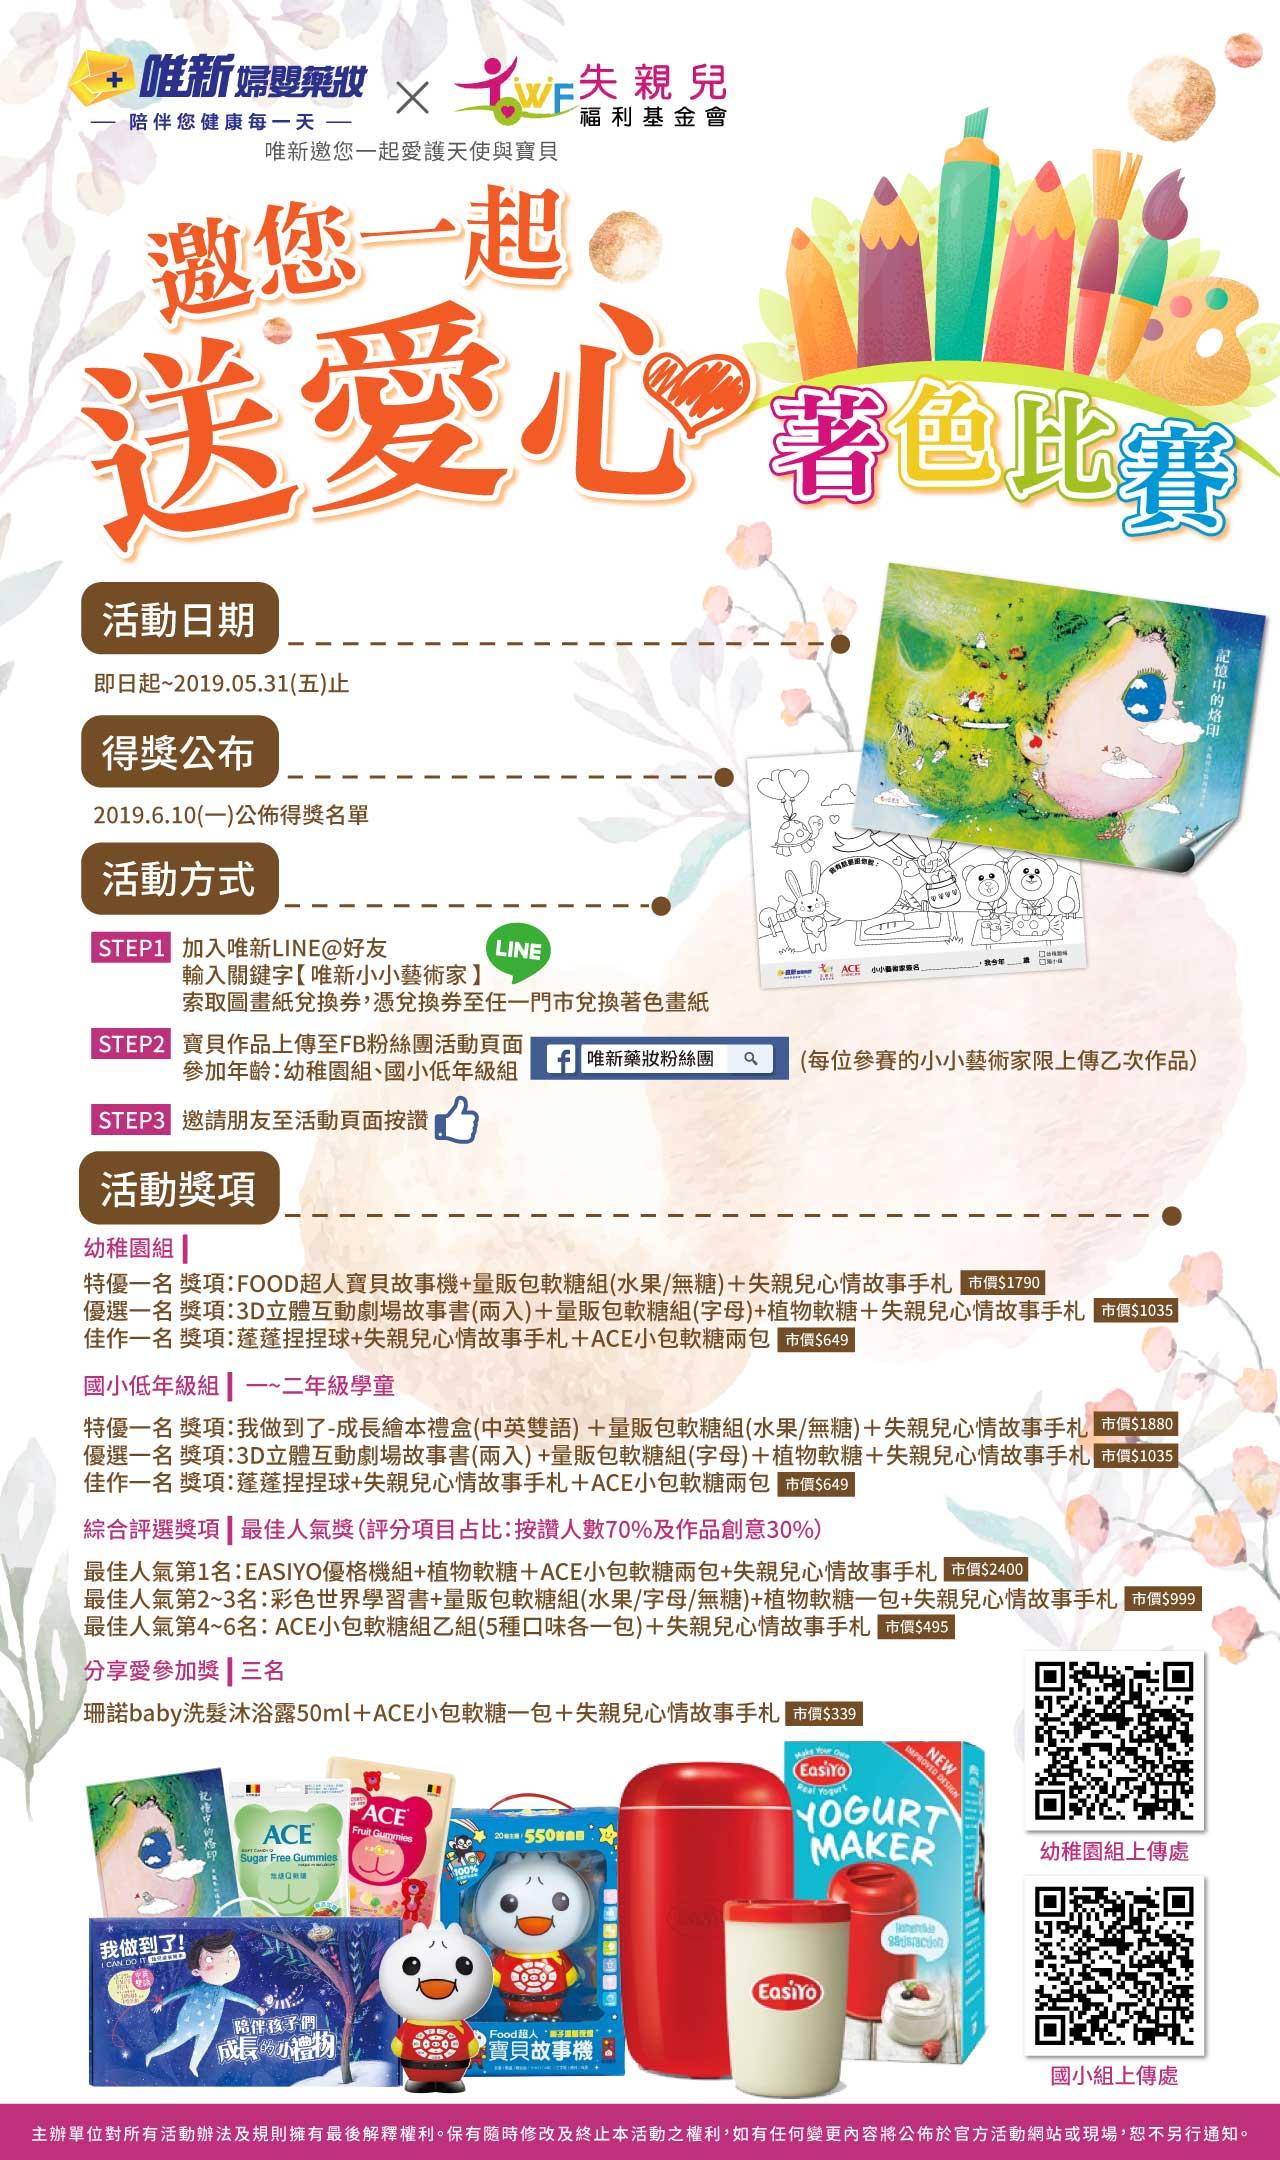 proimages/news/2019/20190502_著色比賽官網(改)_(1).jpg